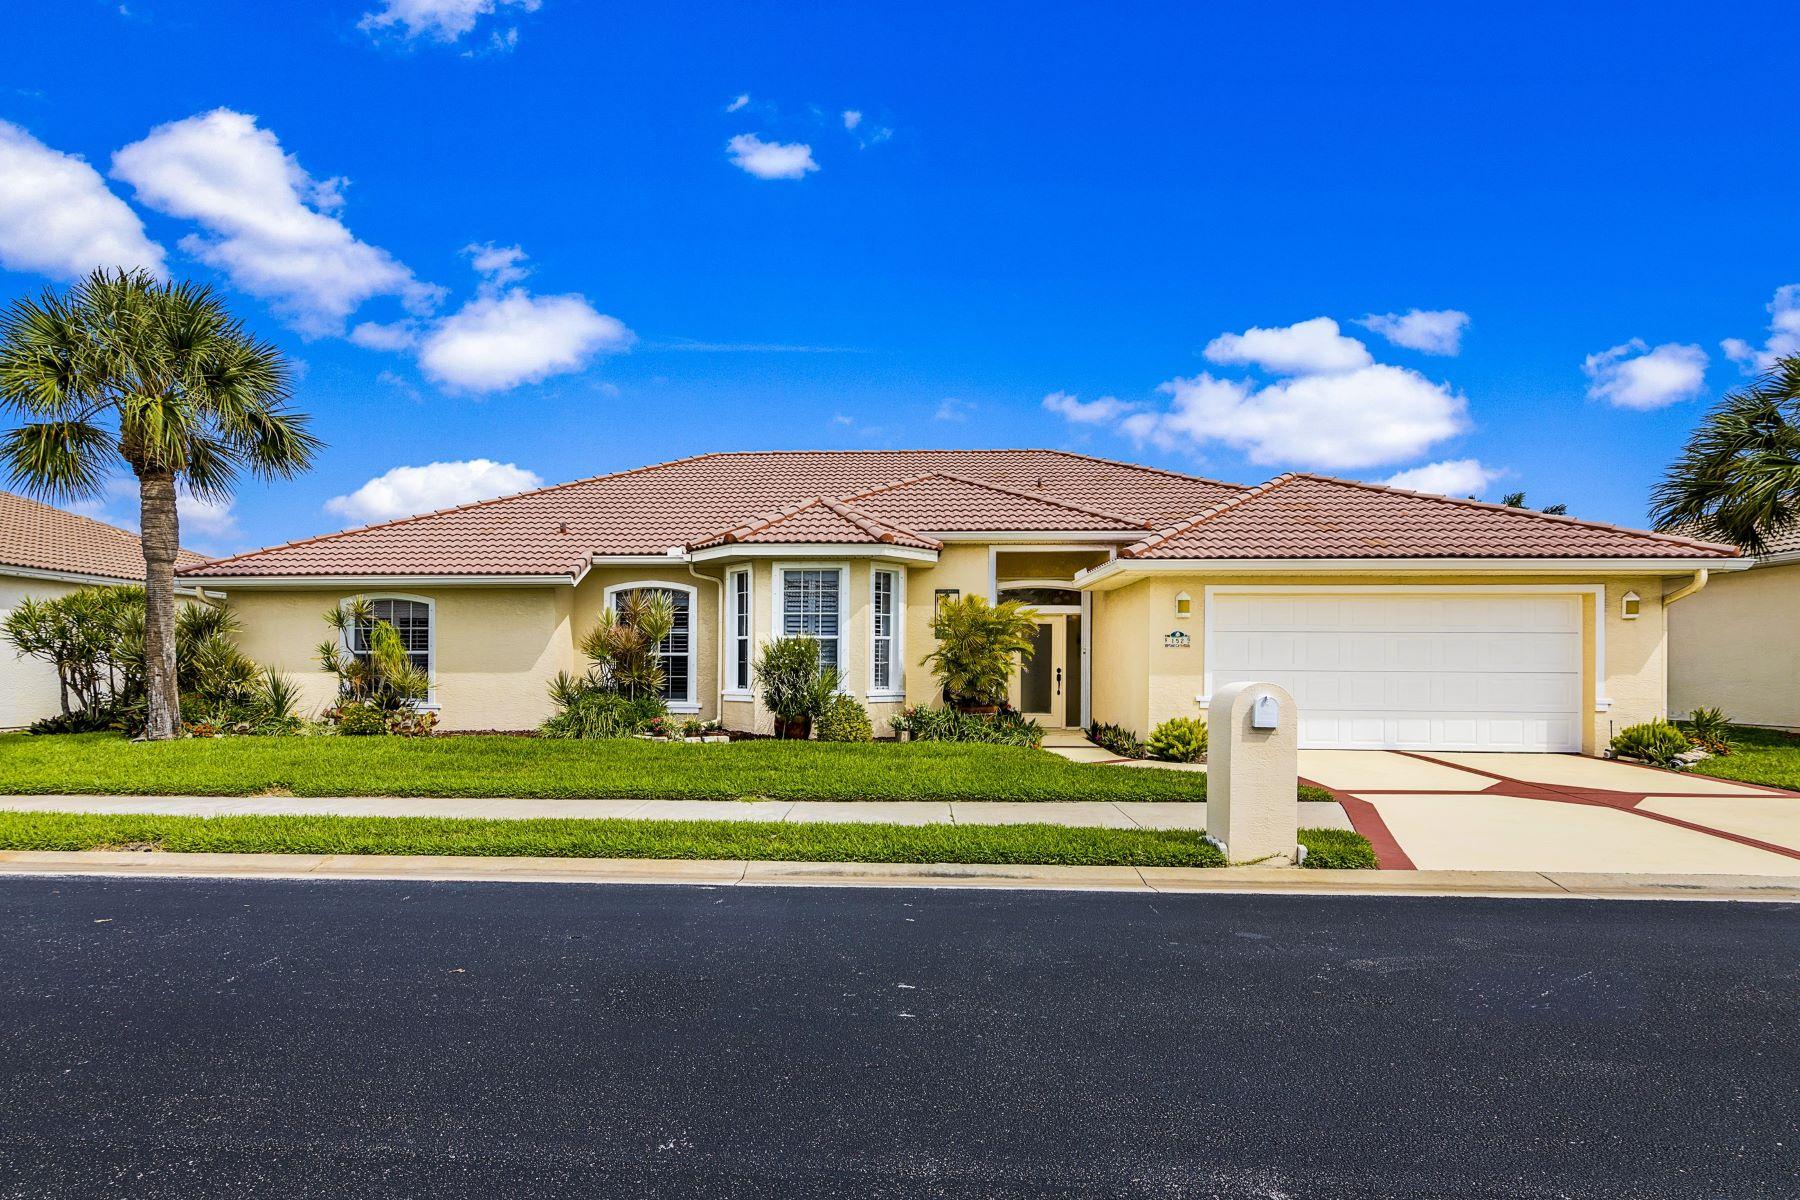 Single Family Homes για την Πώληση στο 152 Sanibel Way, Melbourne Beach, FL 152 Sanibel Way Melbourne Beach, Φλοριντα 32951 Ηνωμένες Πολιτείες